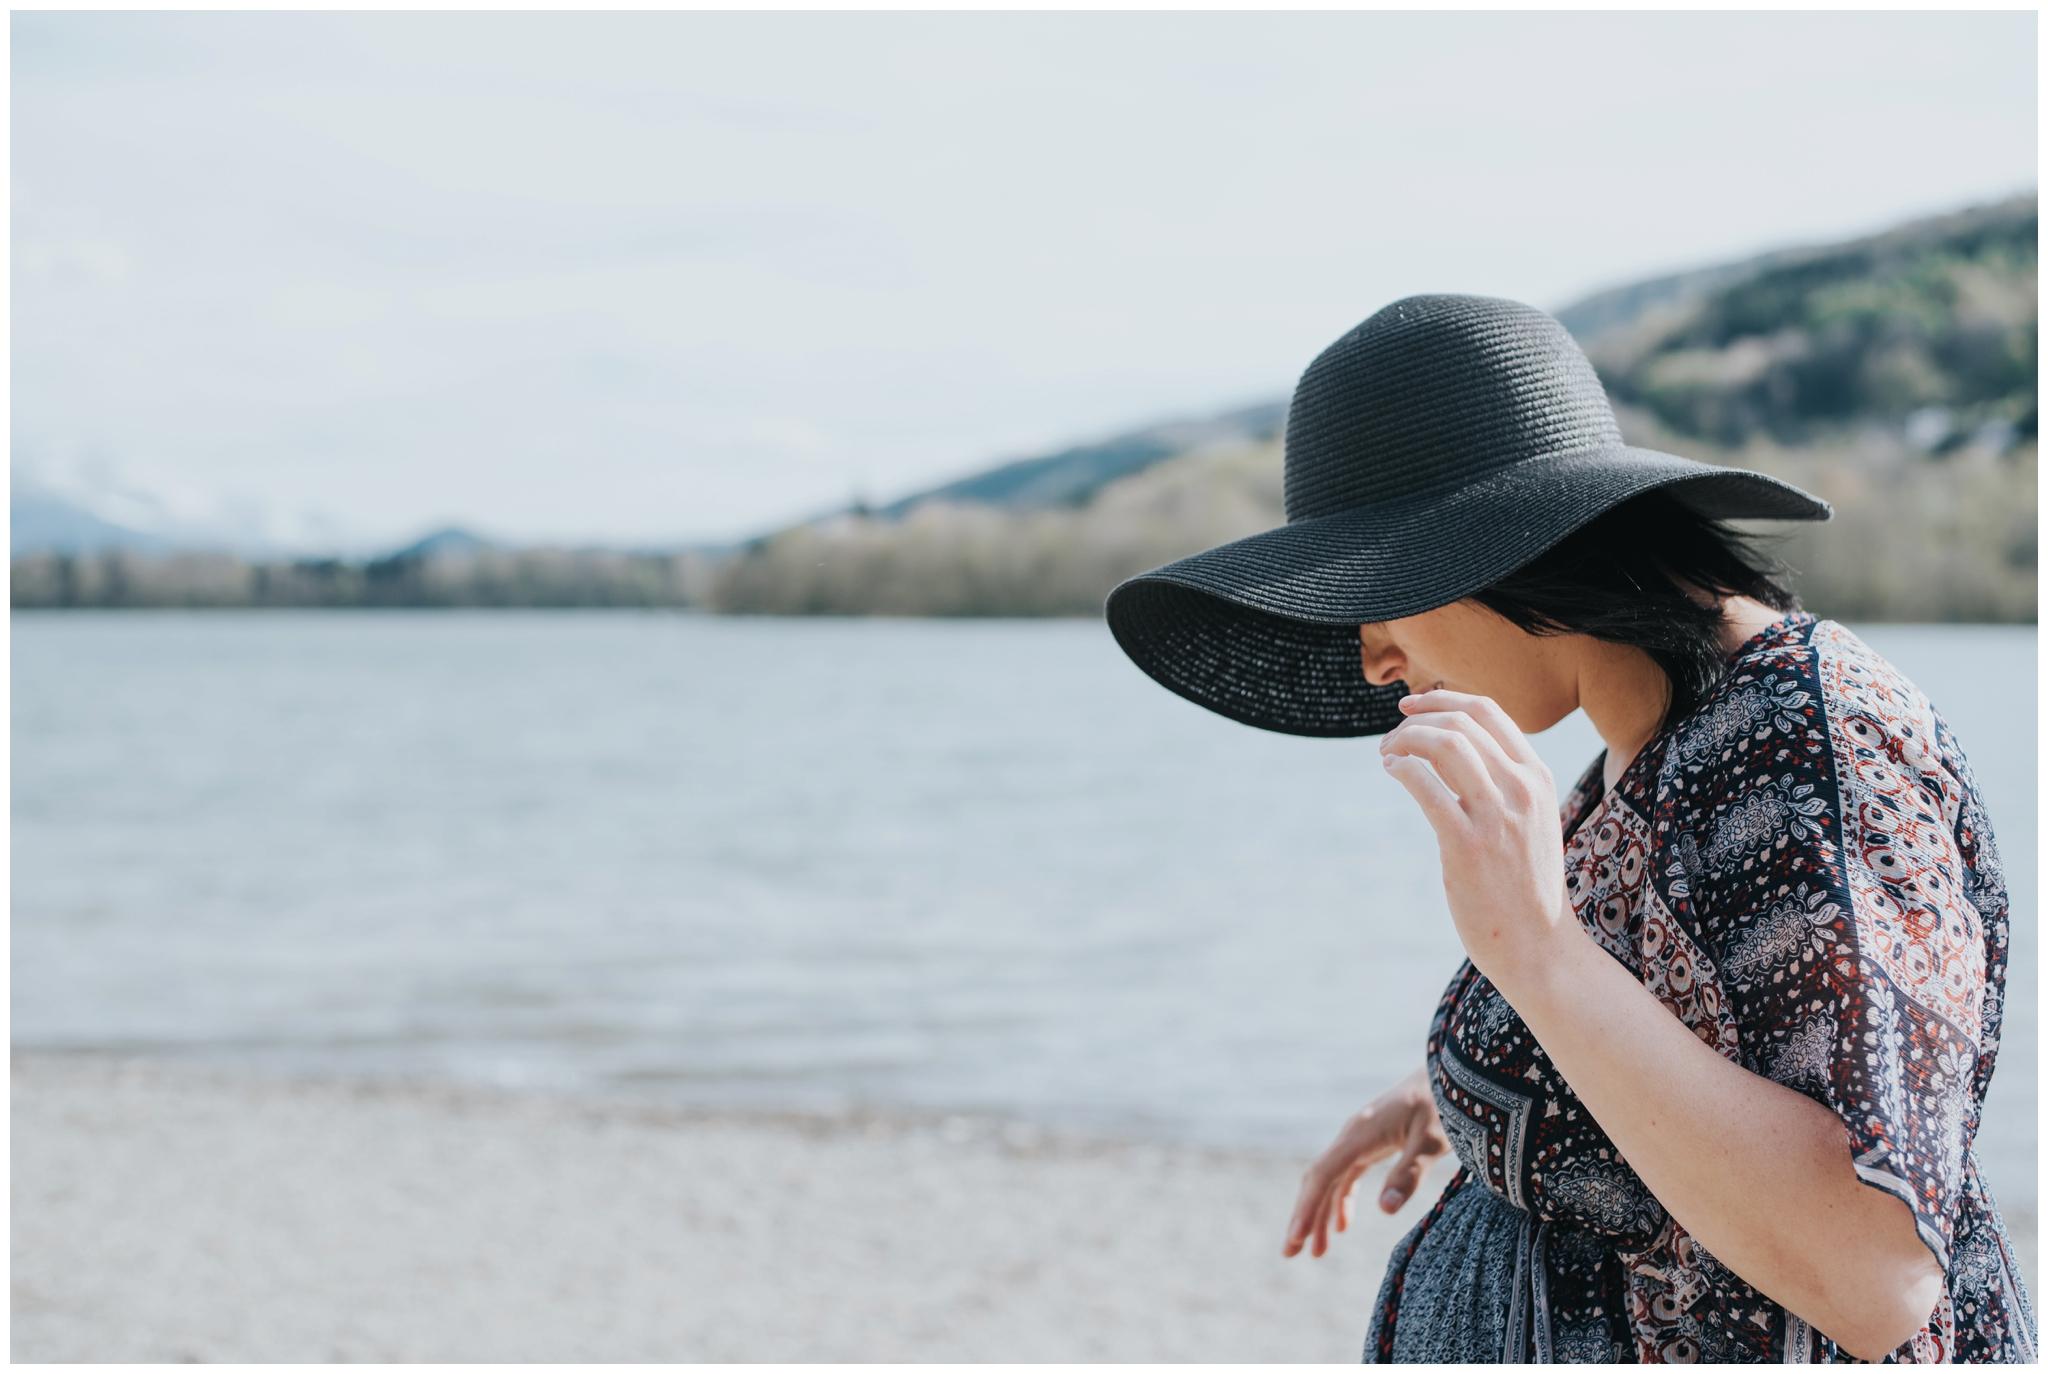 photographe grossesse future maman grenoble annecy lyon naturel lifestyle lac nouveau ne maternite famille seance photo famille _021